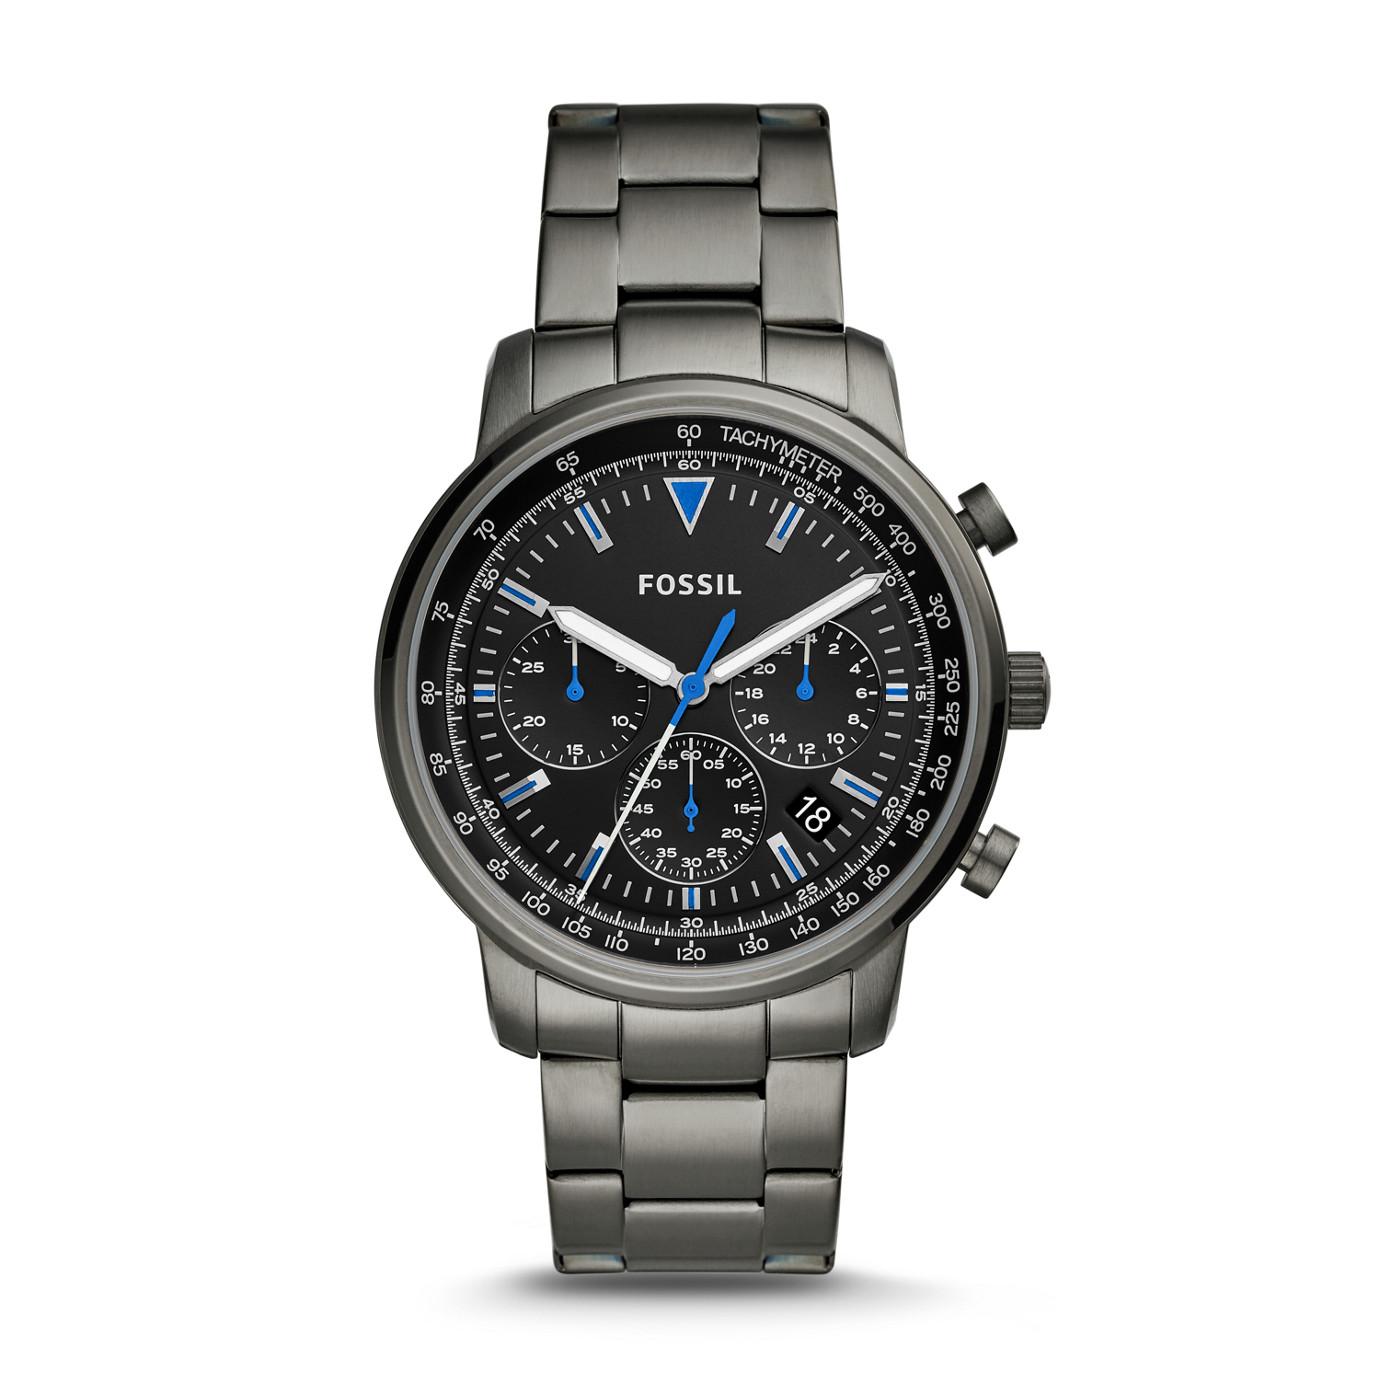 Goodwin Chronograph Smoke Stainless Steel Watch